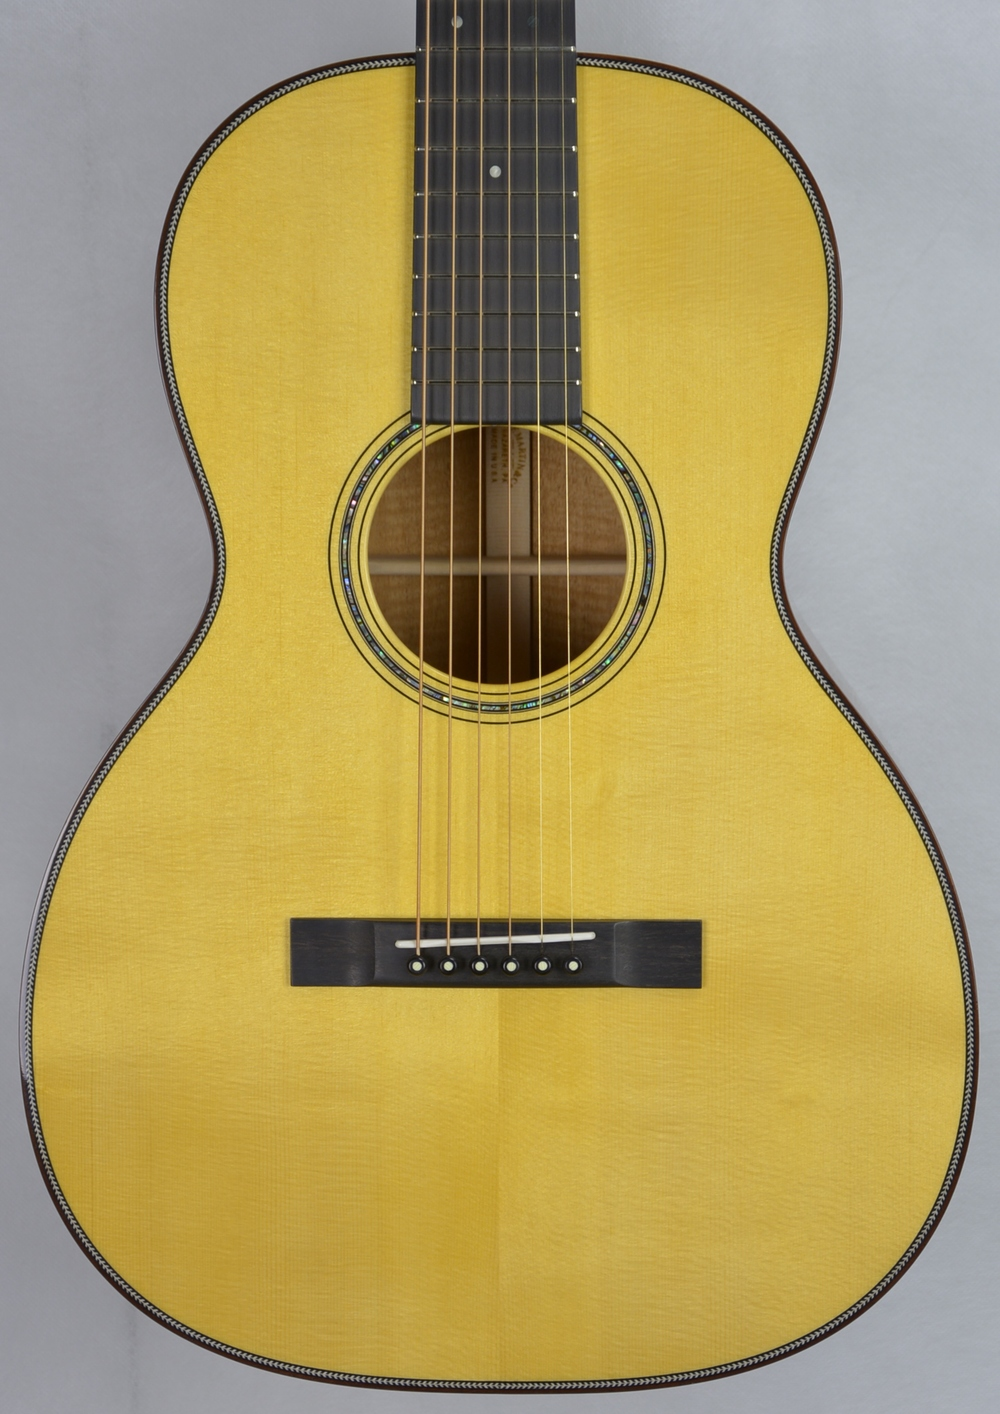 Q-2396024 S-1827233 00-12 Fiddleback Alpine Fine HB (5).JPG